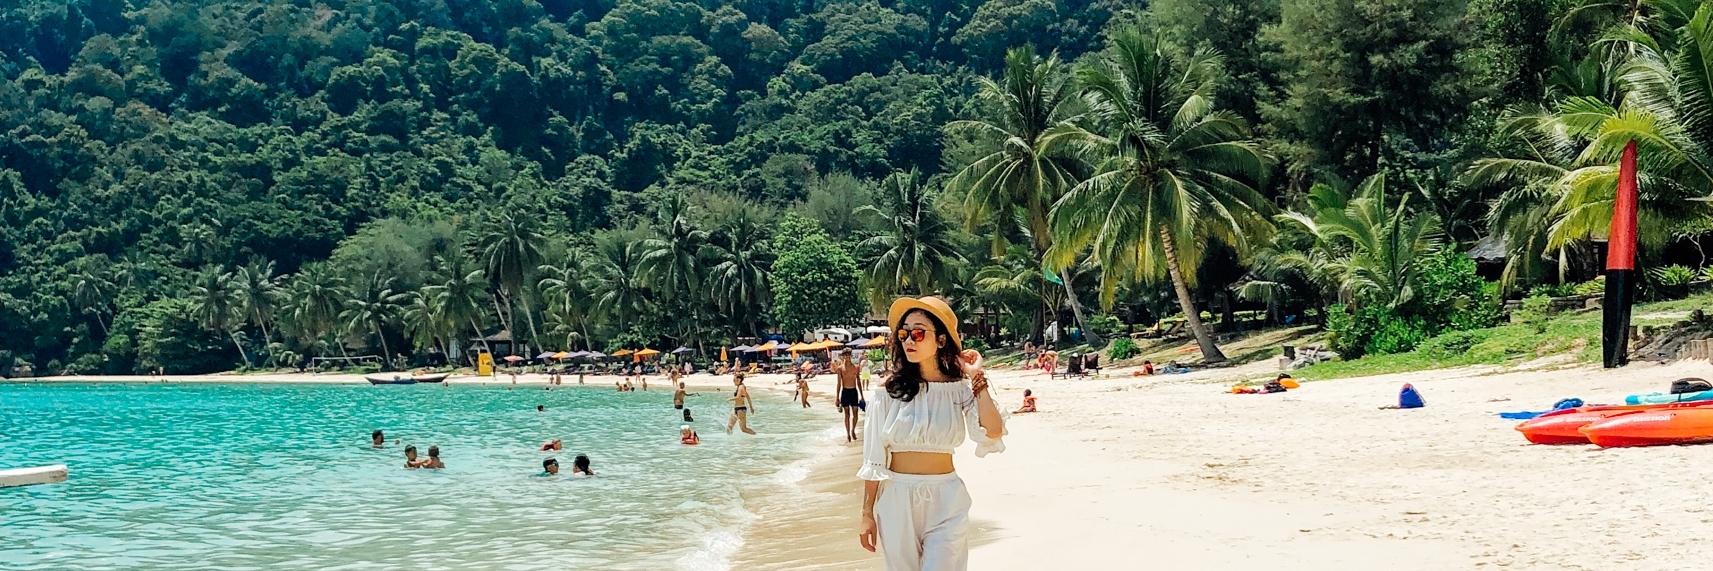 https://gody.vn/blog/ngocanh.ngth3776/post/perhentian-islands-thien-duong-hoang-so-moi-toe-o-malaysia-4286